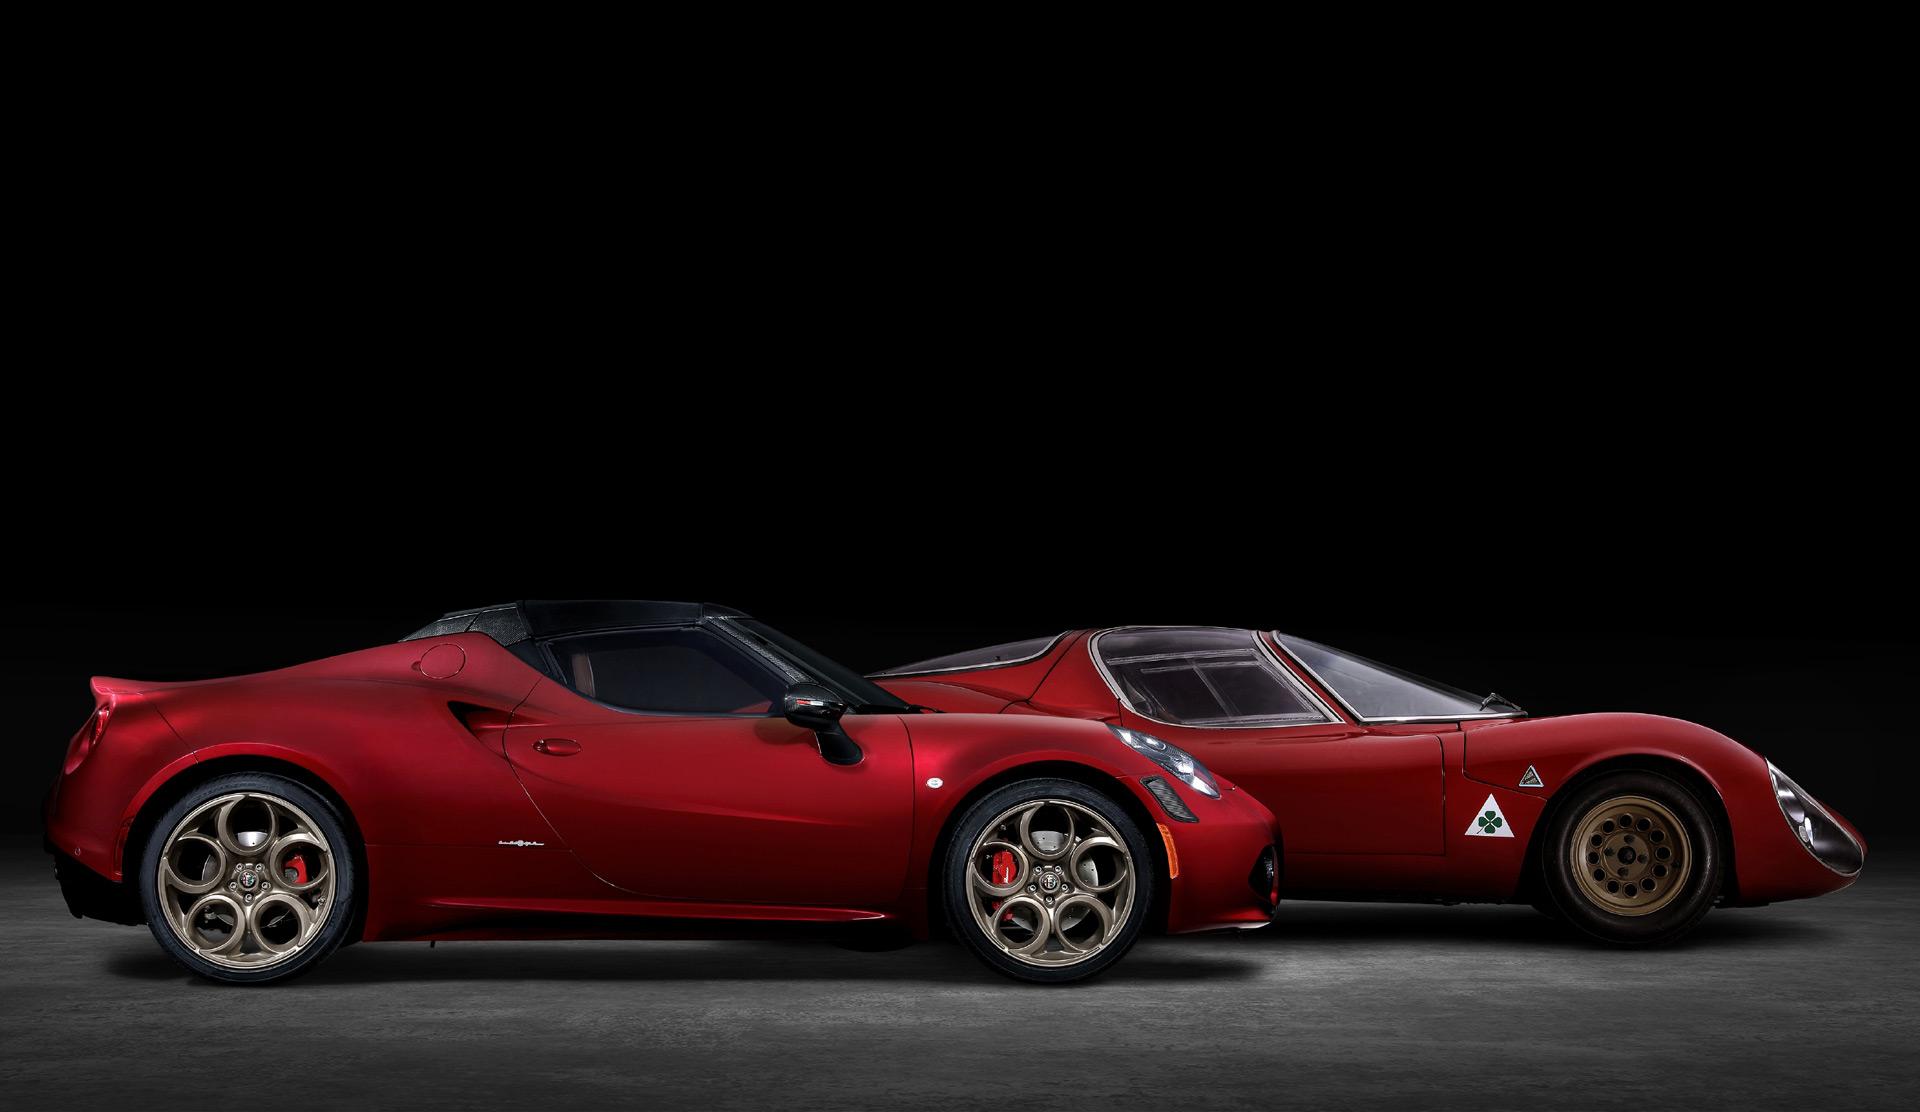 Alfa Romeo 4C Spider 33 Stradale Tributo เพียง 33 คัน ส่งท้ายสำหรับโมเดล 4C